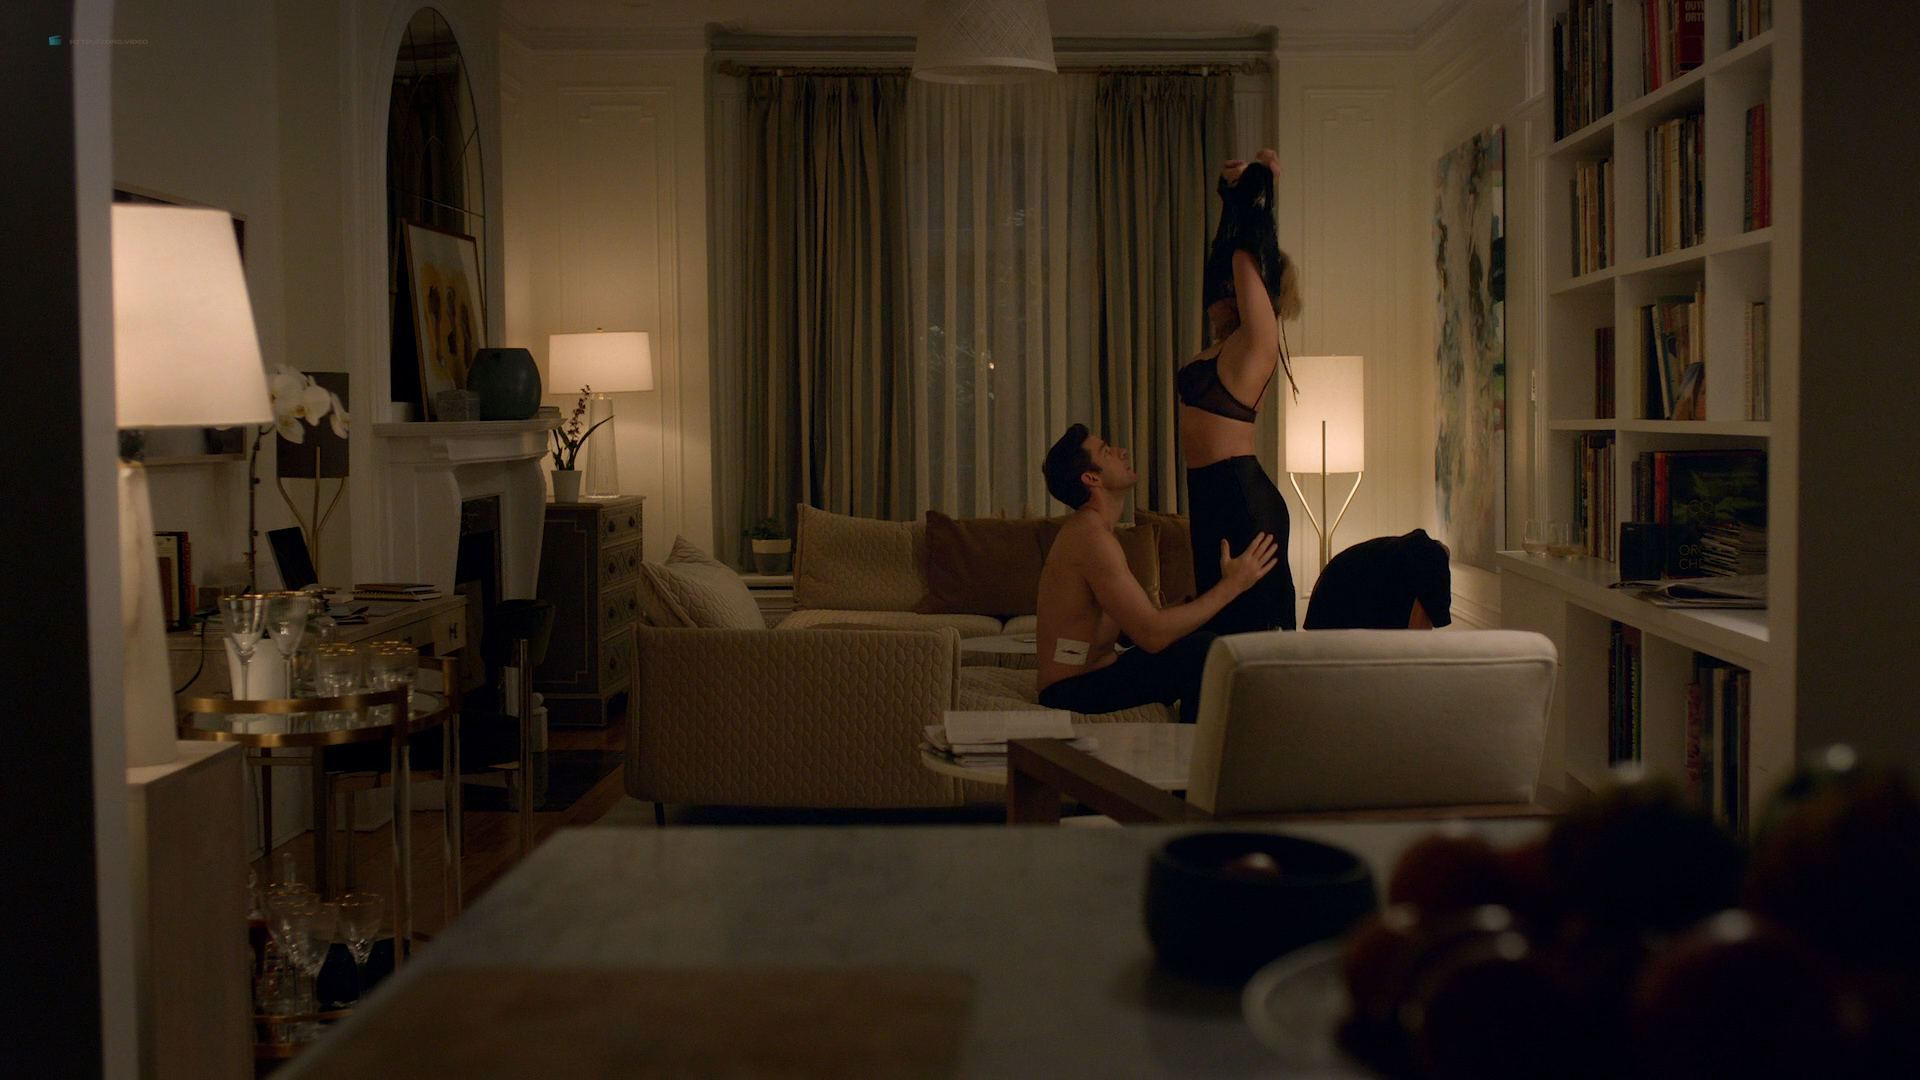 0110160522206_04_Abbie-Cornish-nude-topless-and-sex-Tom-Clancys-Jack-Ryan-2018-s1e4-HD-1080p-03.jpg